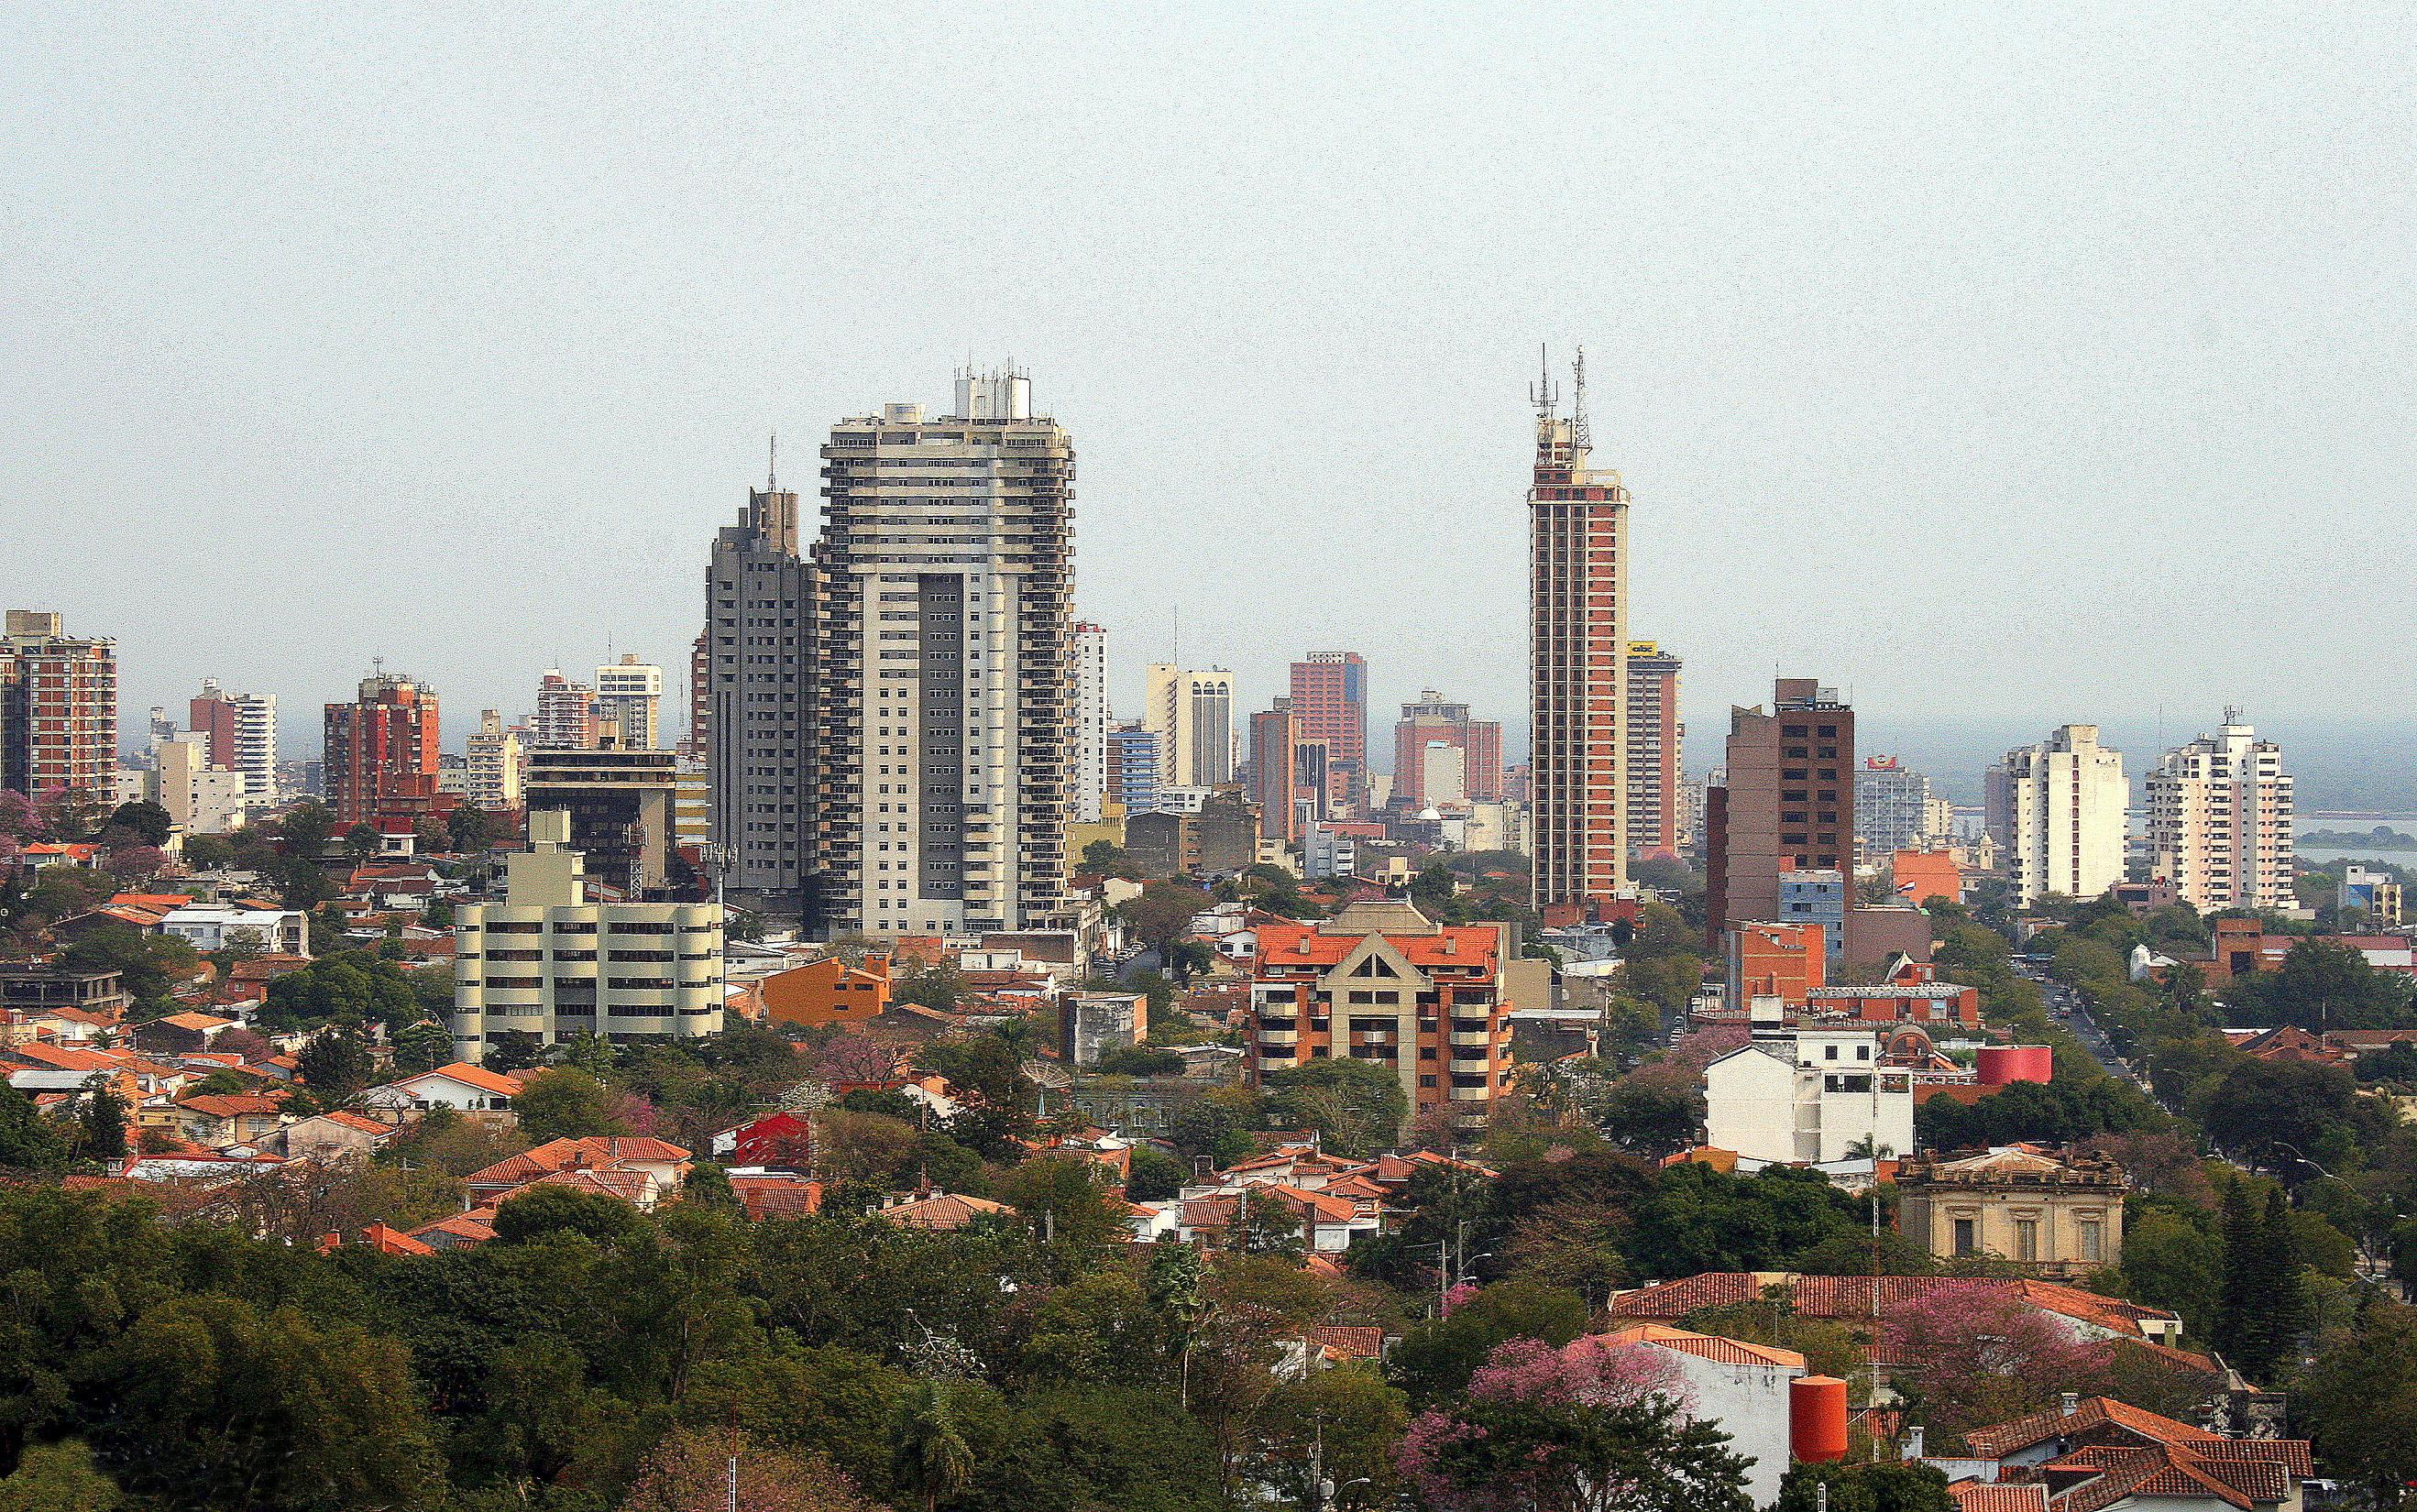 Skyscraper Wallpaper Hd File Asunci 211 N Asunci 243 N Paraguay Jpg Wikimedia Commons